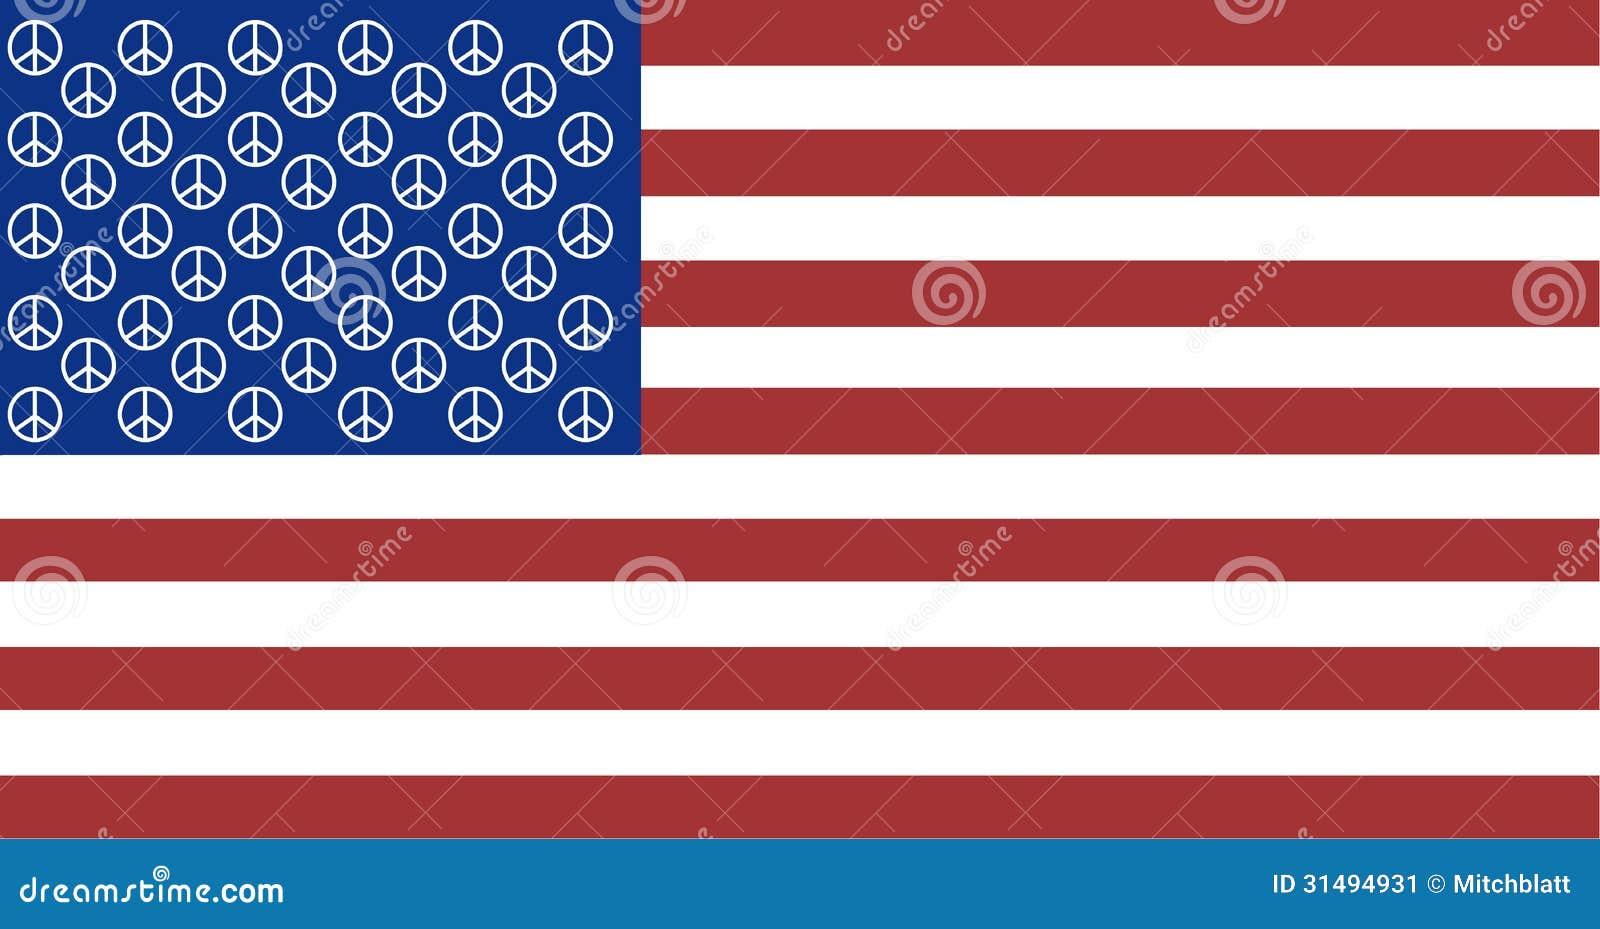 50 stars represent